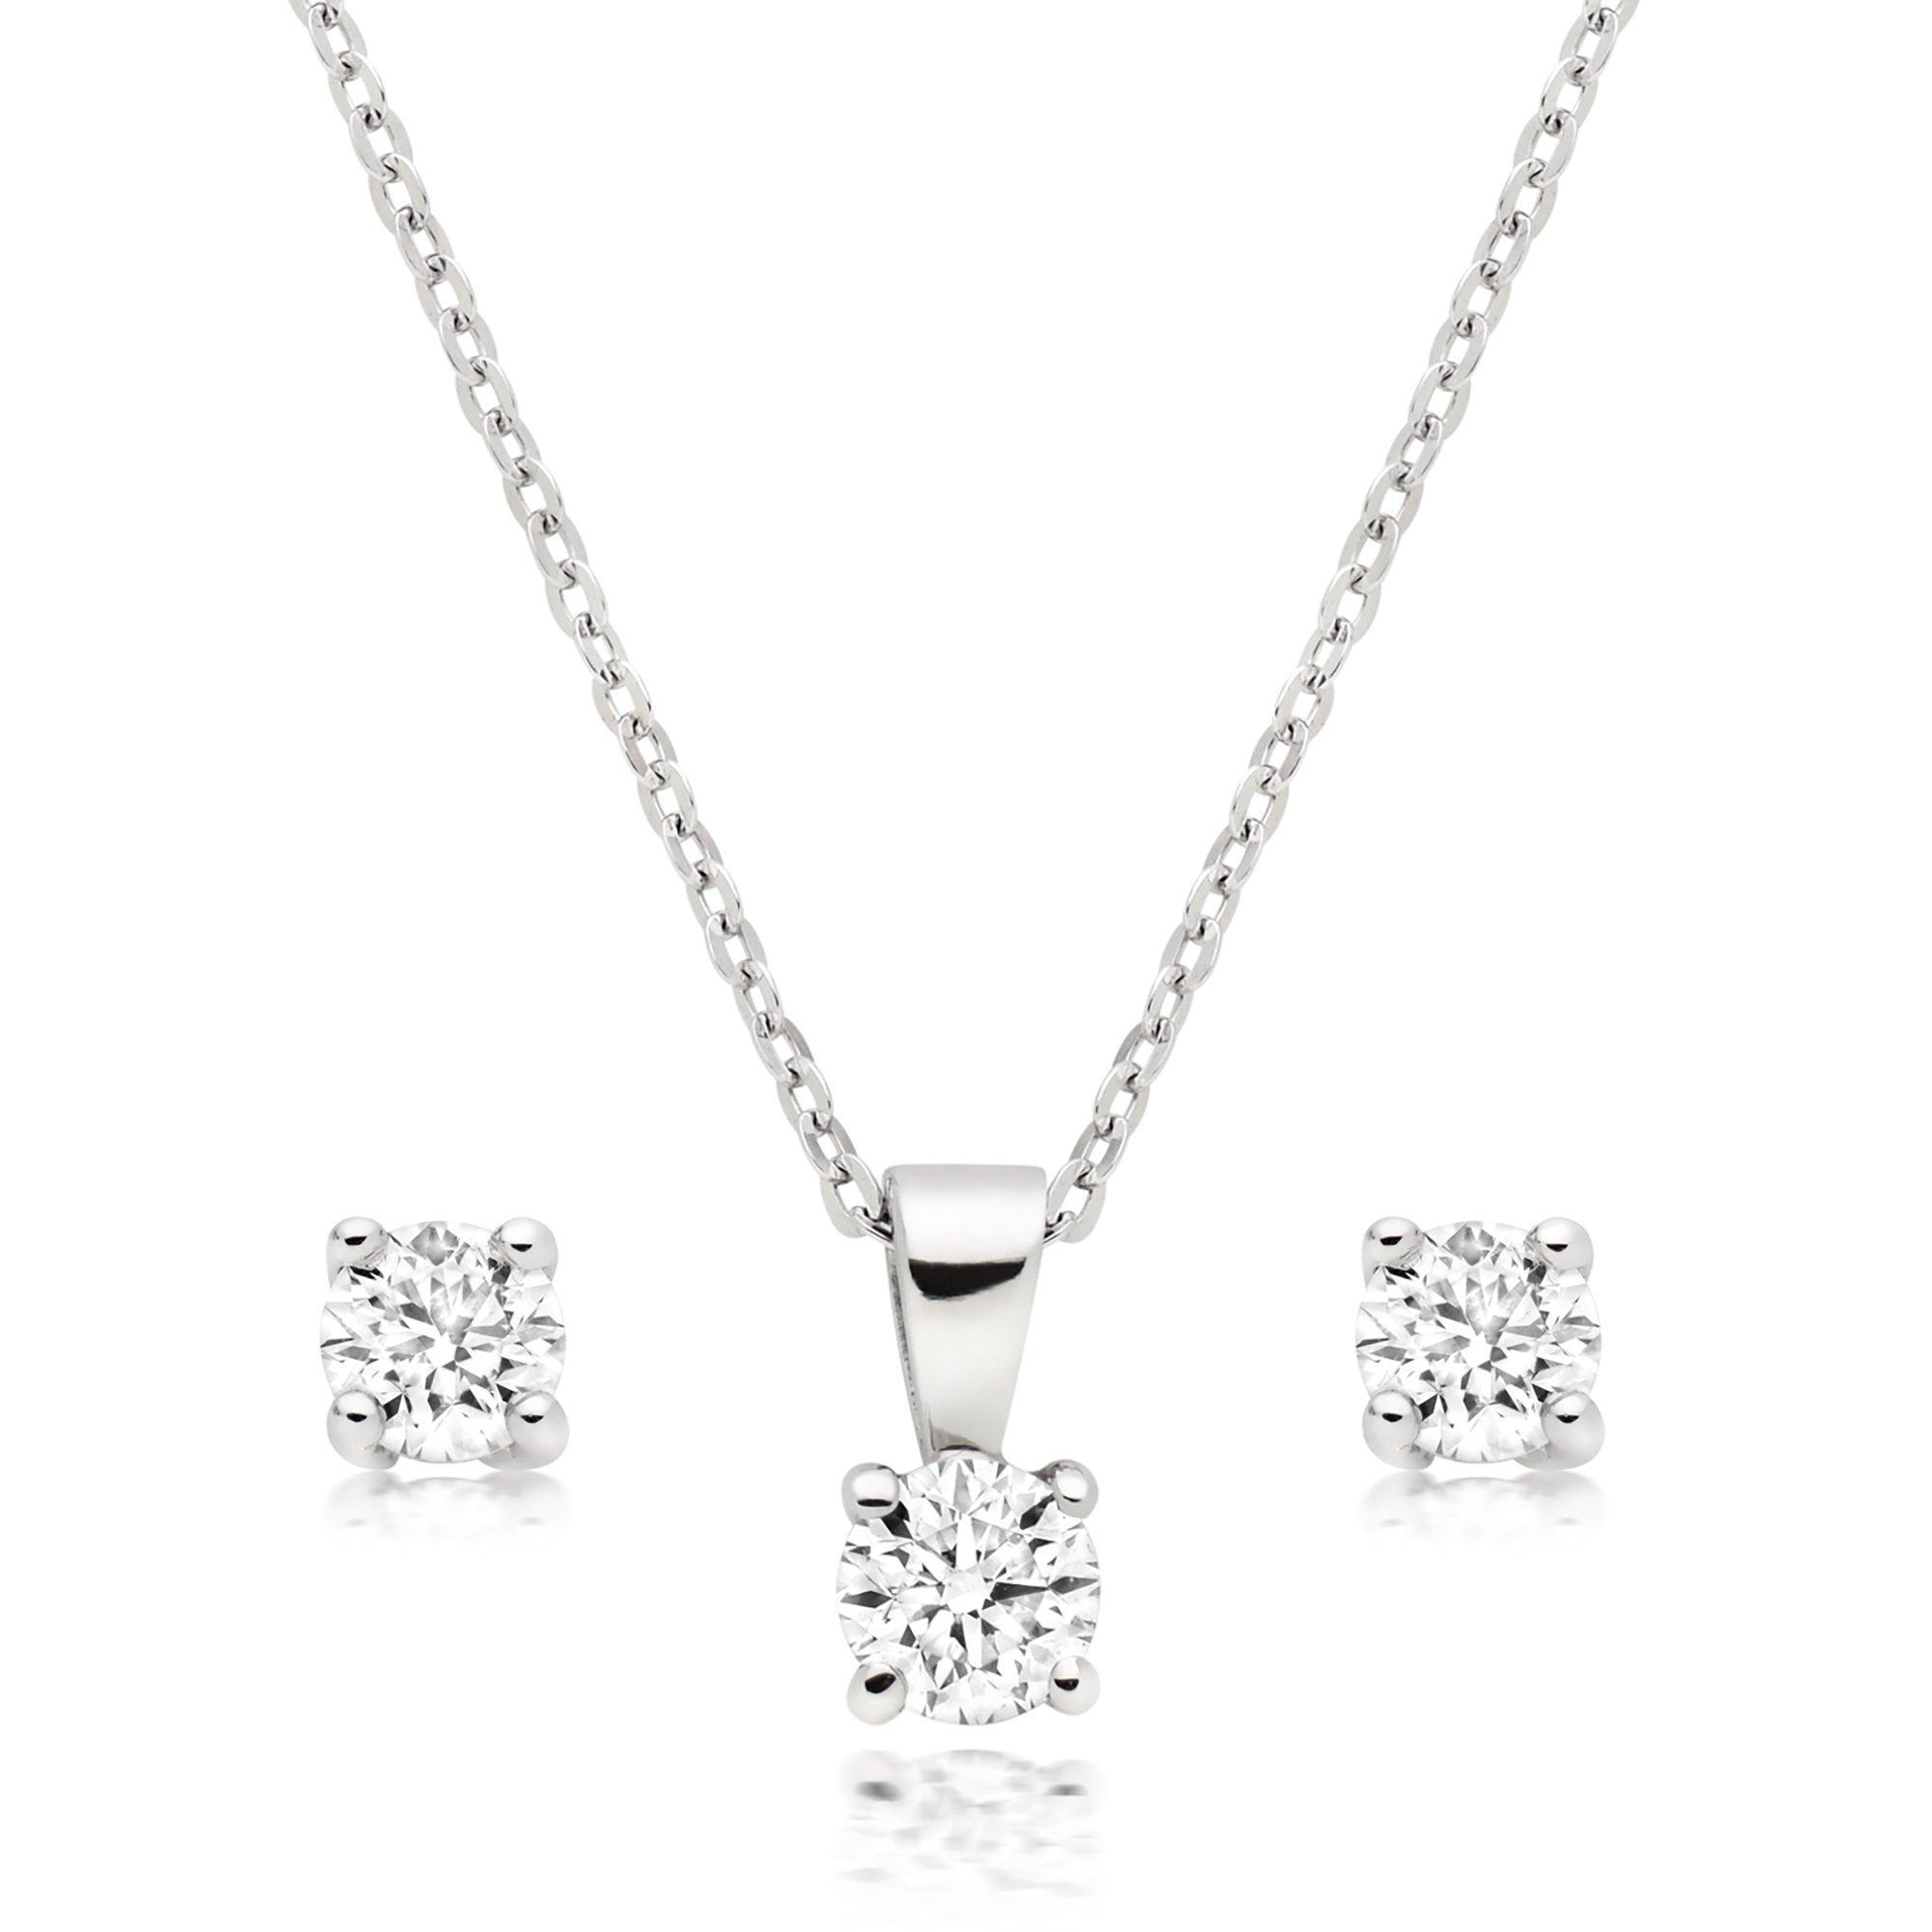 Platinum Diamond Pendant and Earrings Set